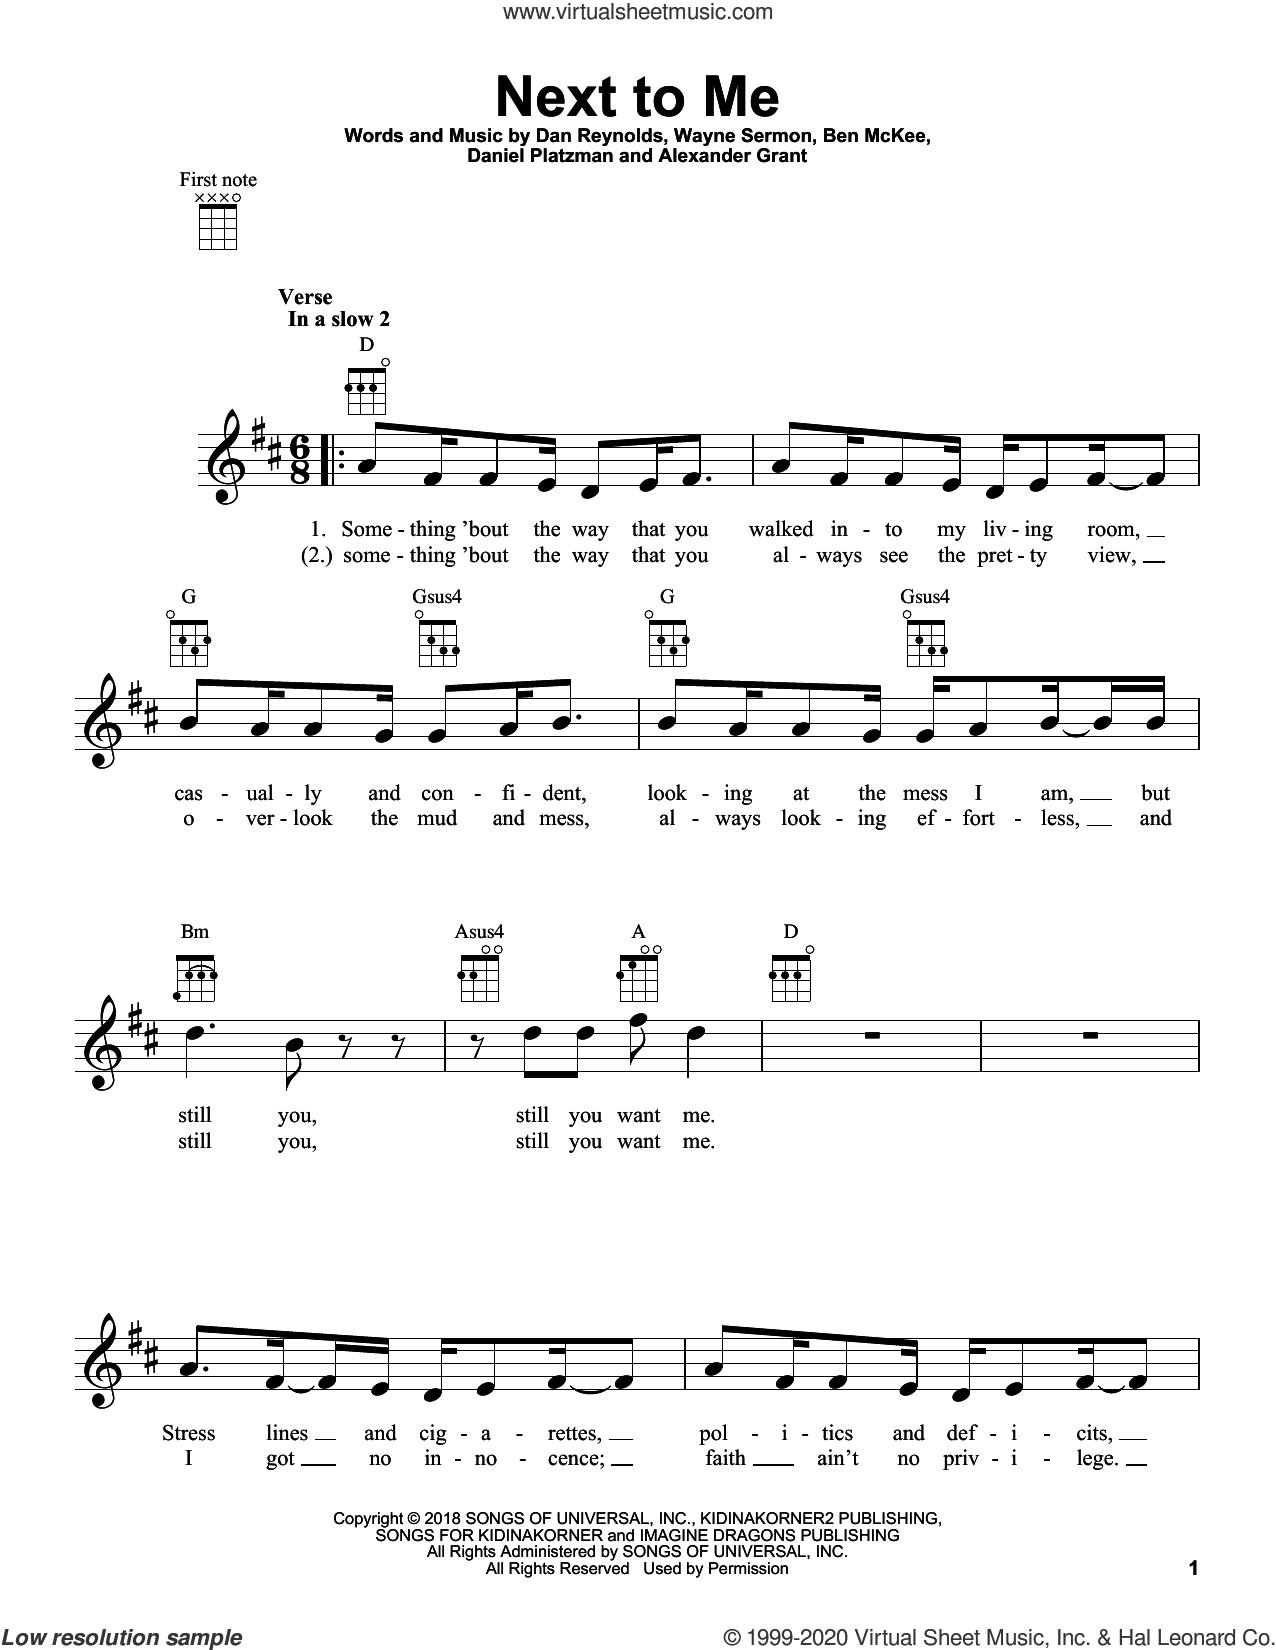 Next To Me sheet music for ukulele by Imagine Dragons, Alexander Grant, Ben McKee, Dan Reynolds, Daniel Platzman and Wayne Sermon, intermediate skill level